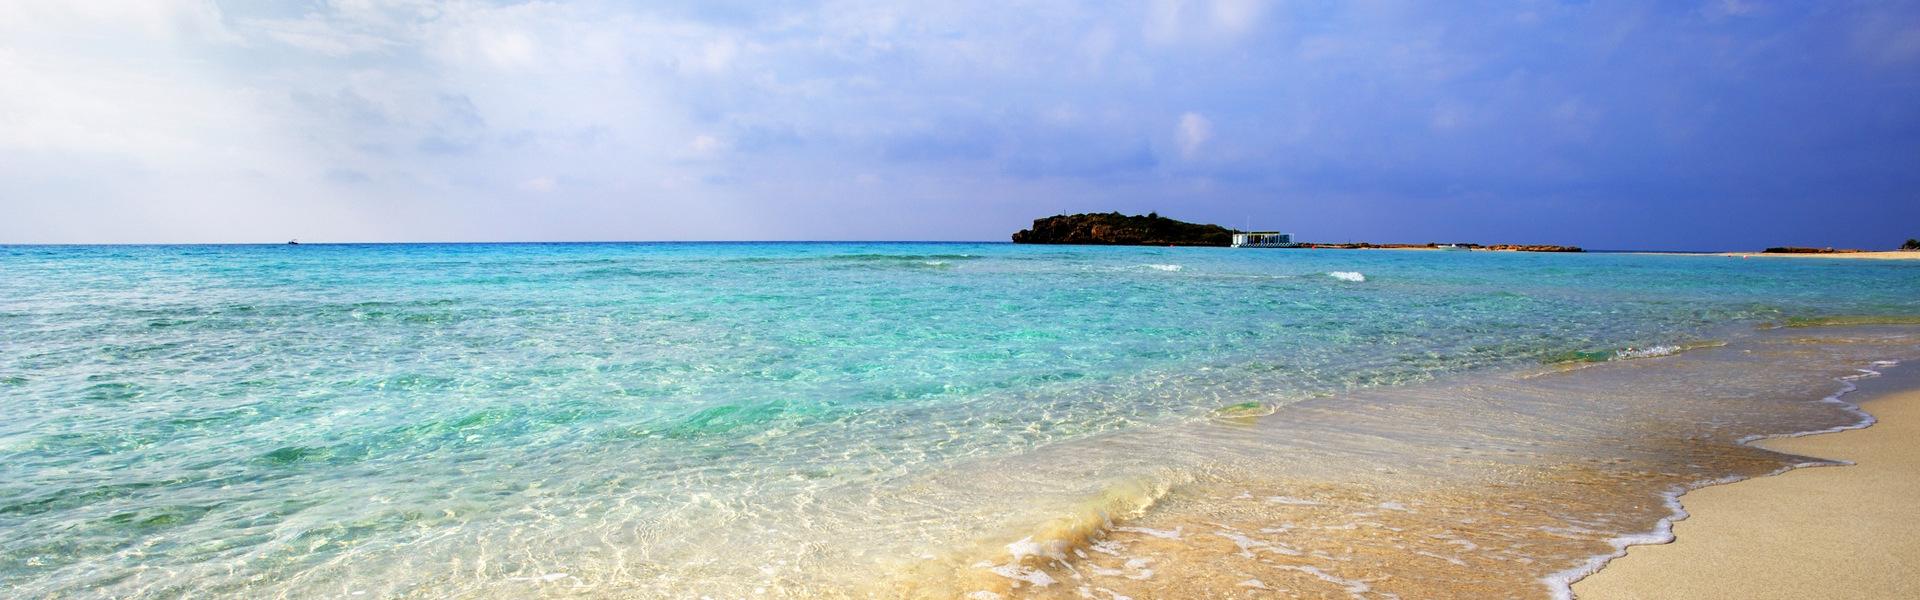 Nissi_beach_5_Agia_Napa_lrg-002